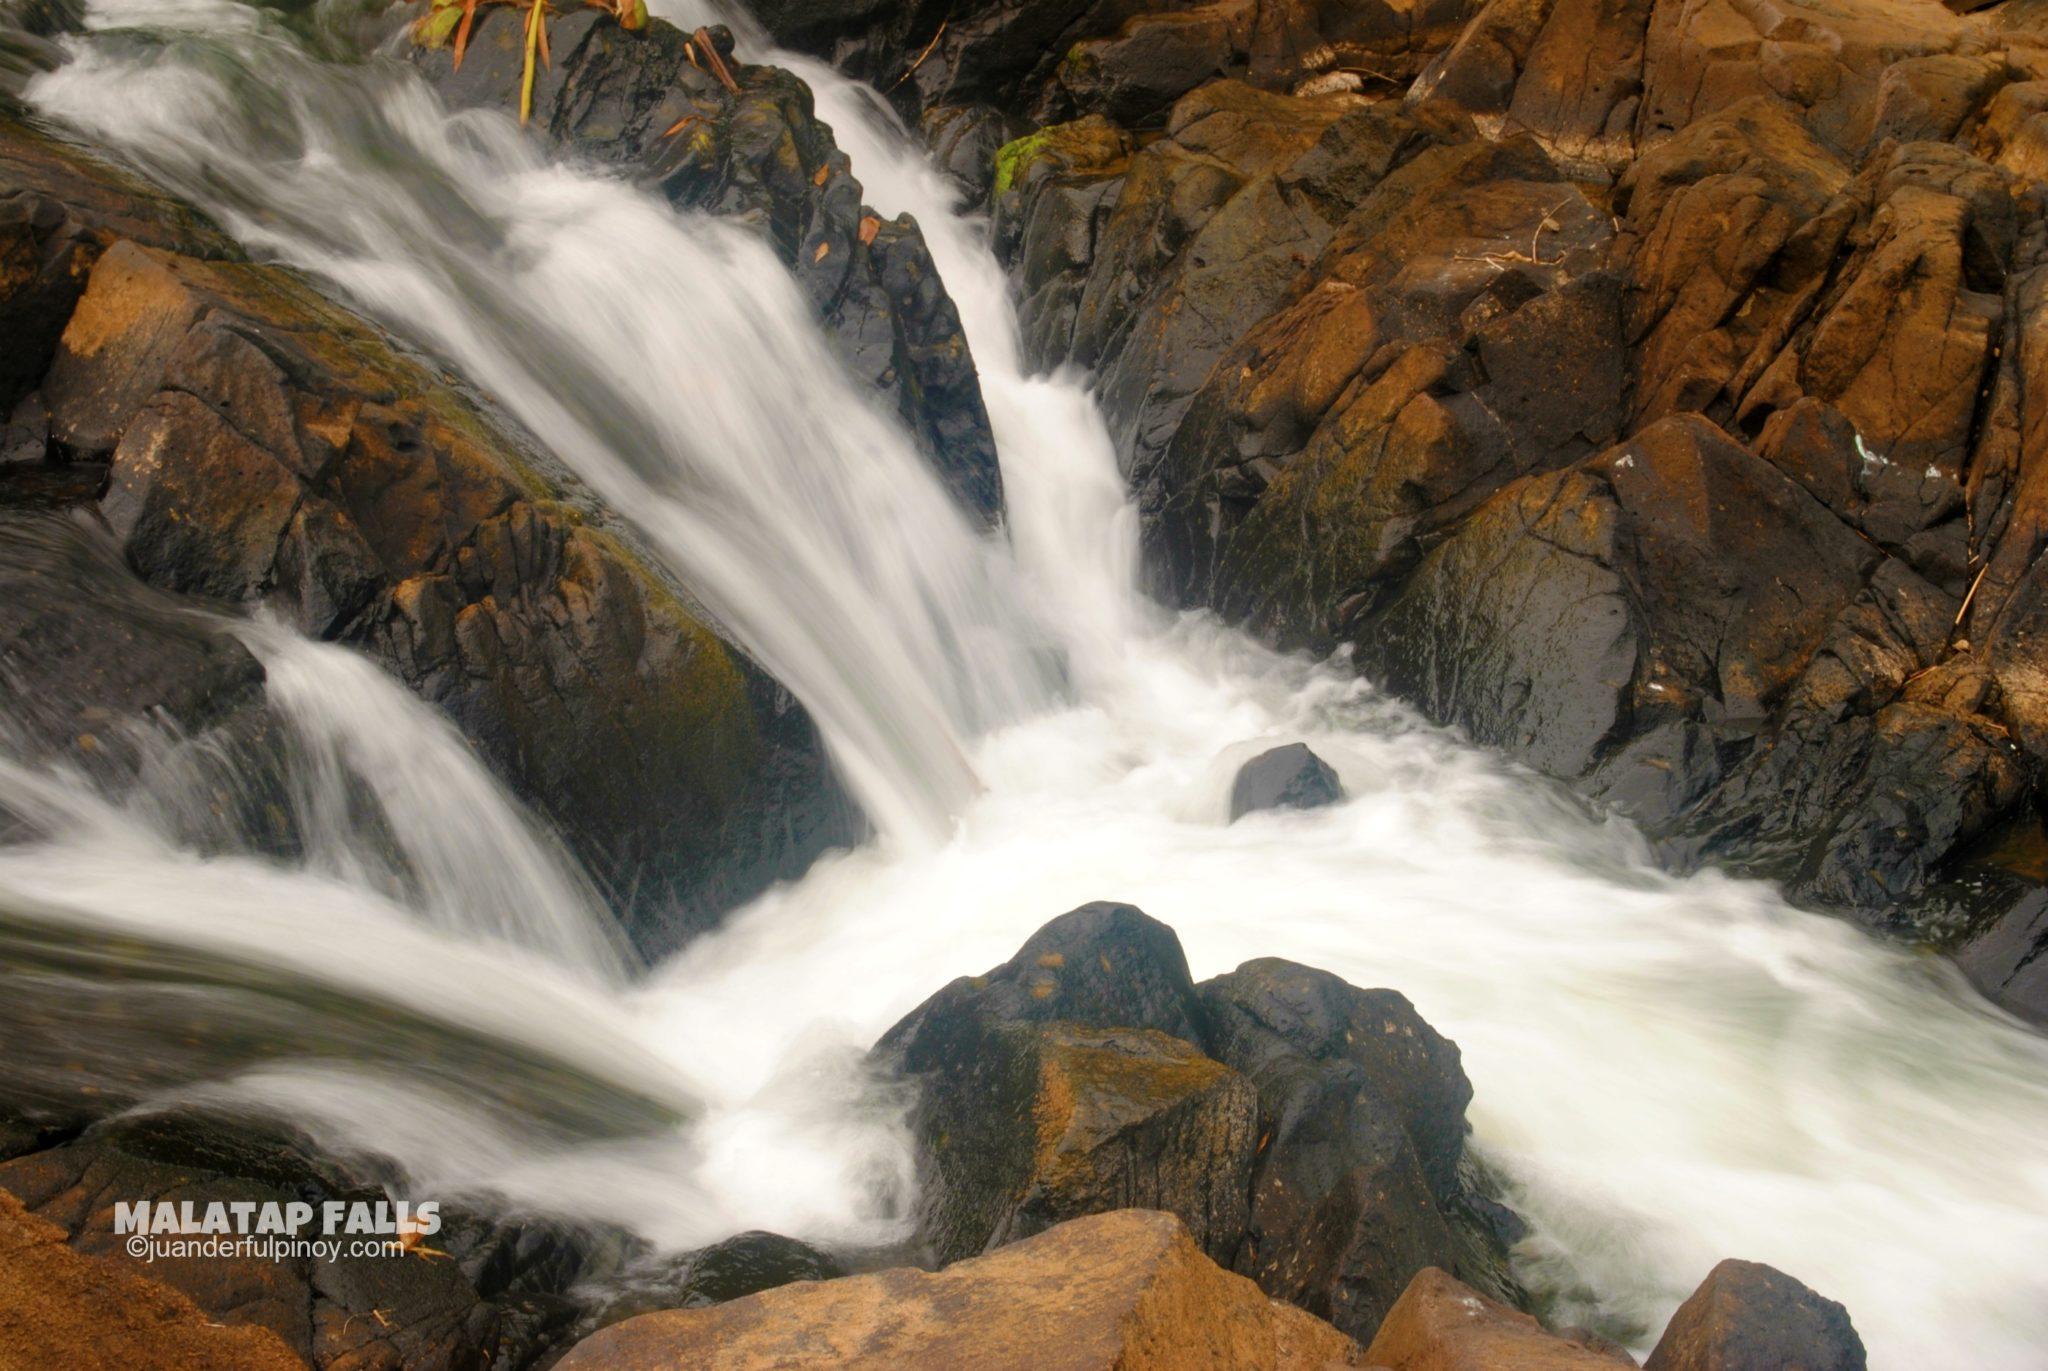 Malatap Falls